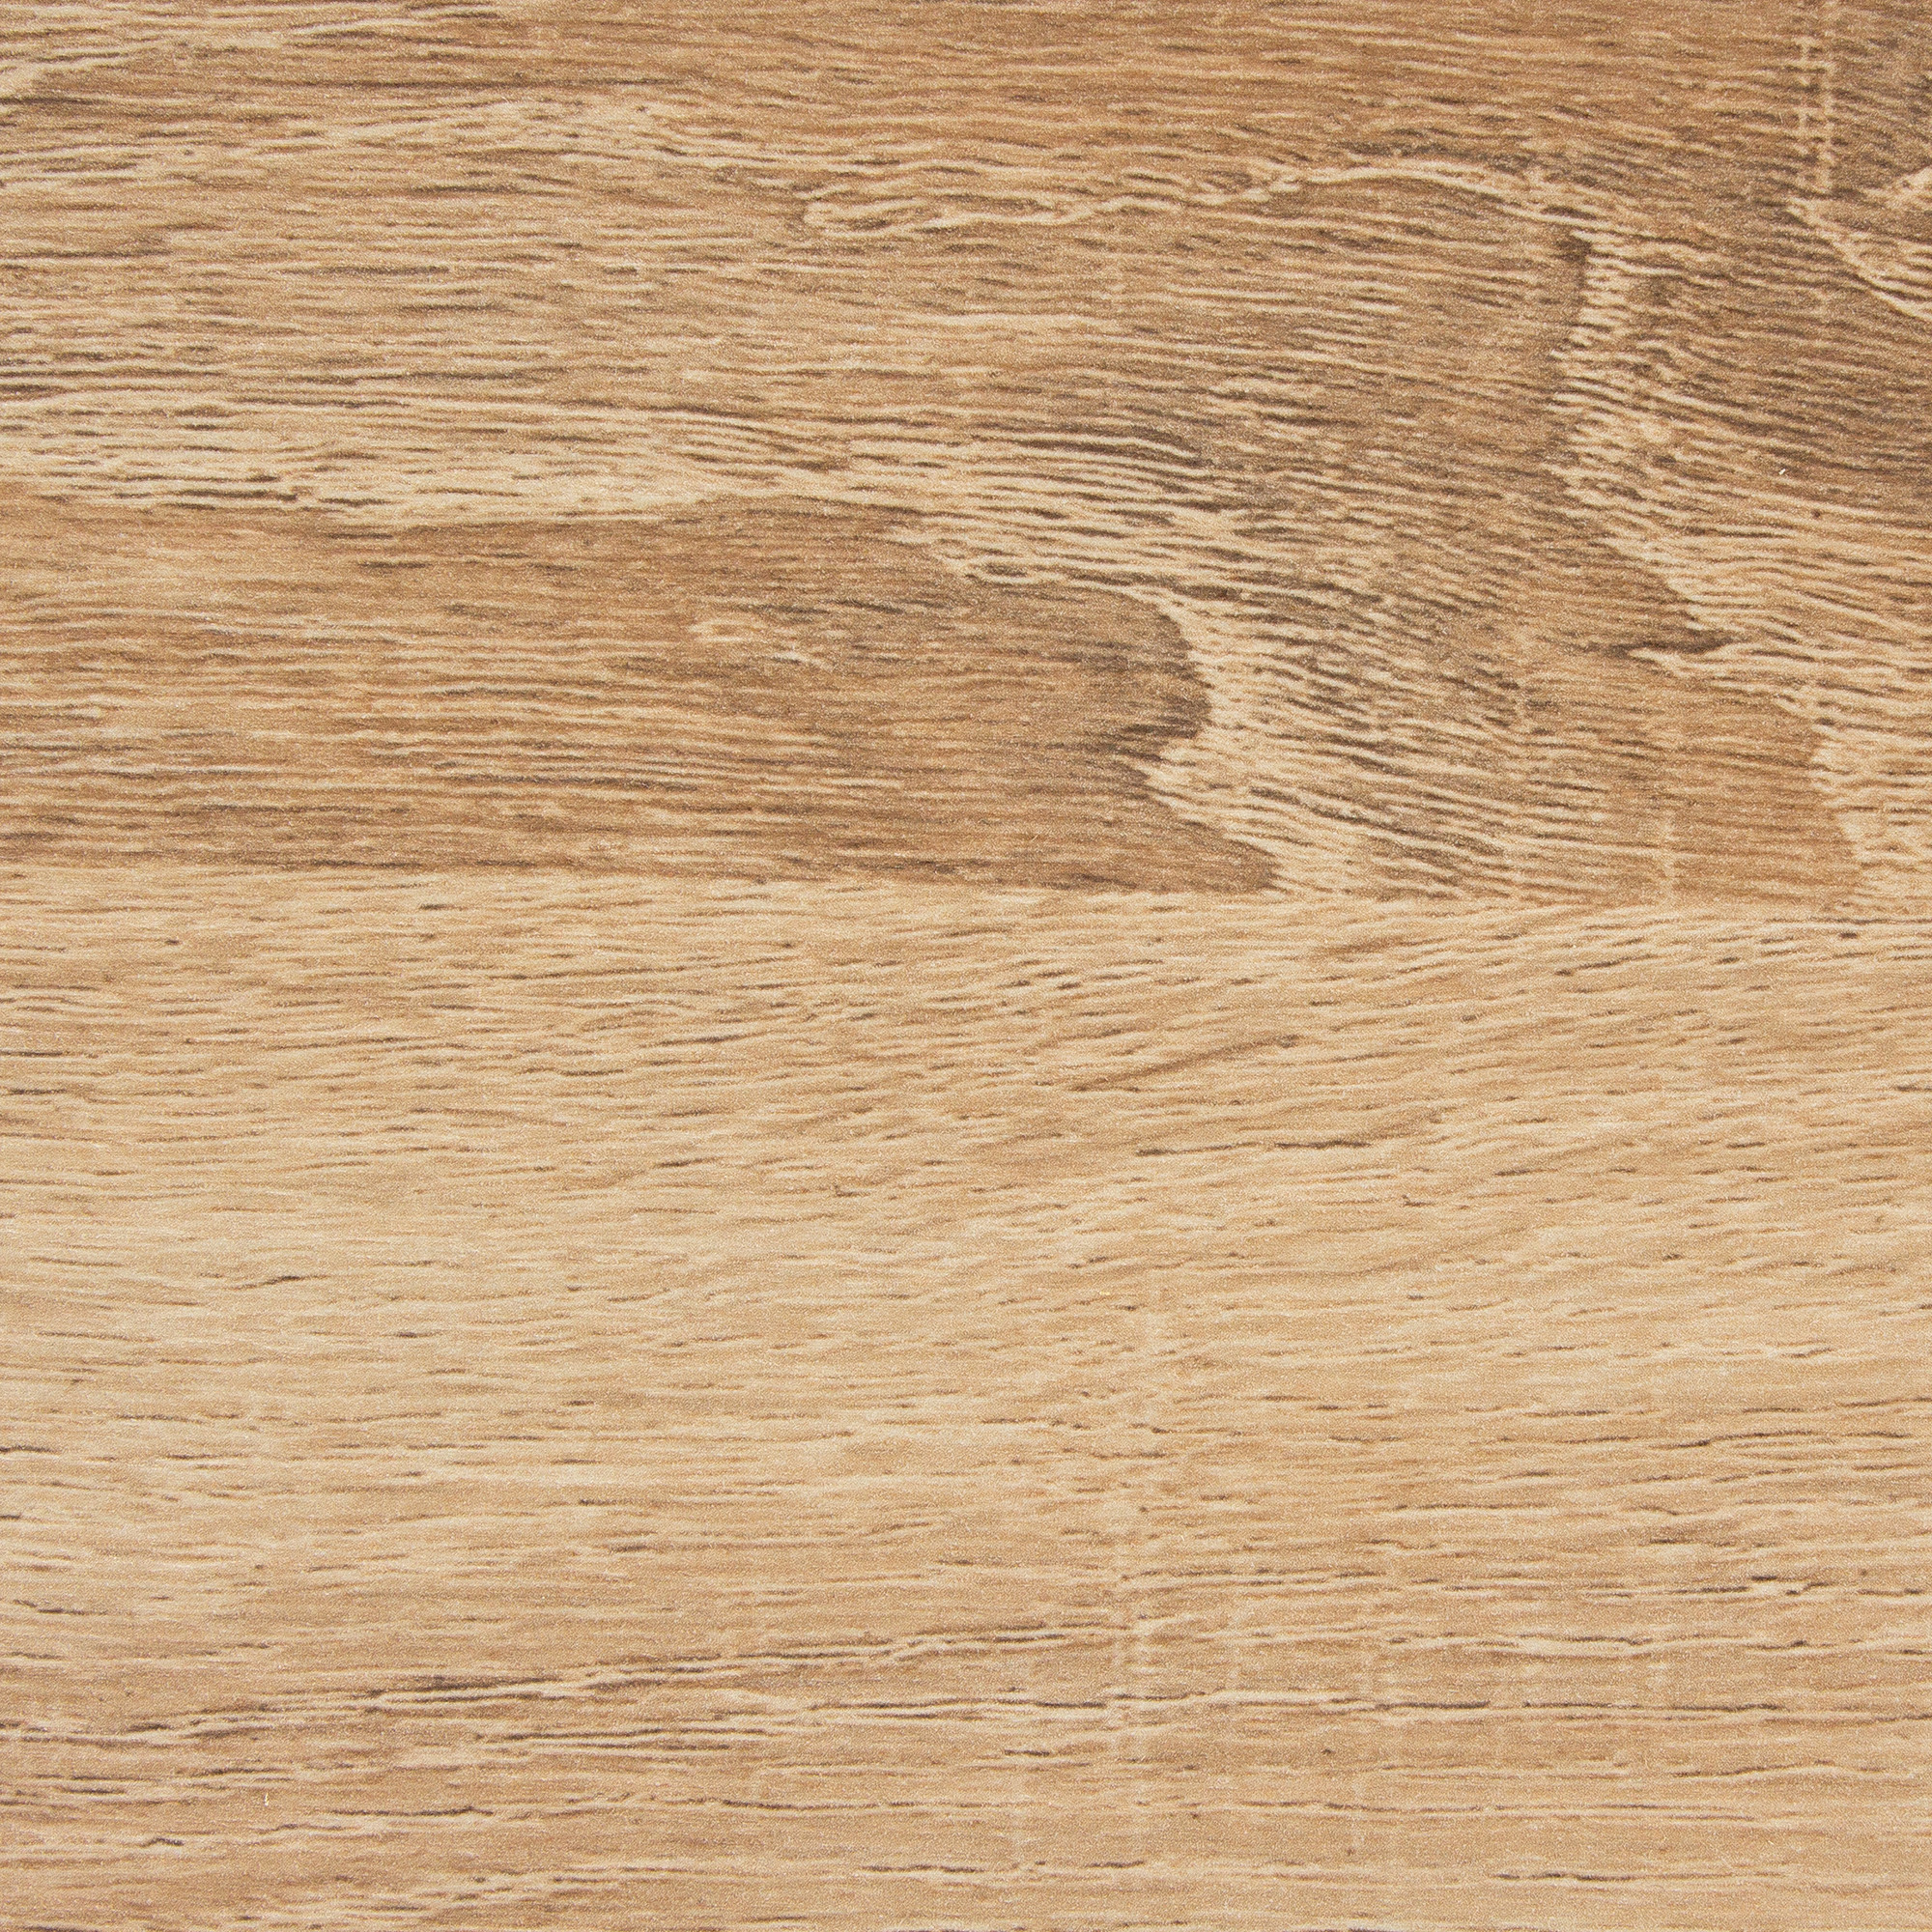 Столешница «Вереск», 240х3.8х60 см, ЛДСП, цвет бежевый